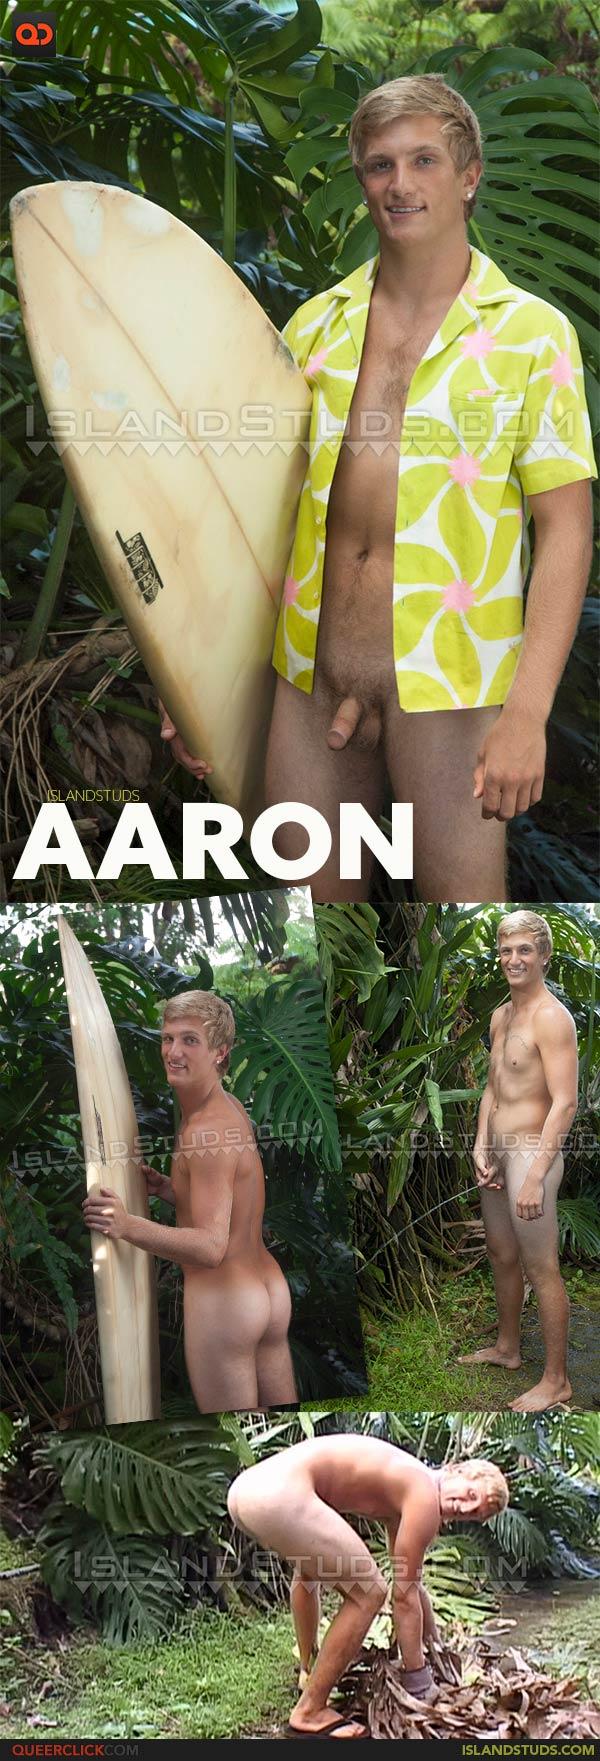 Island Studs: Aaron